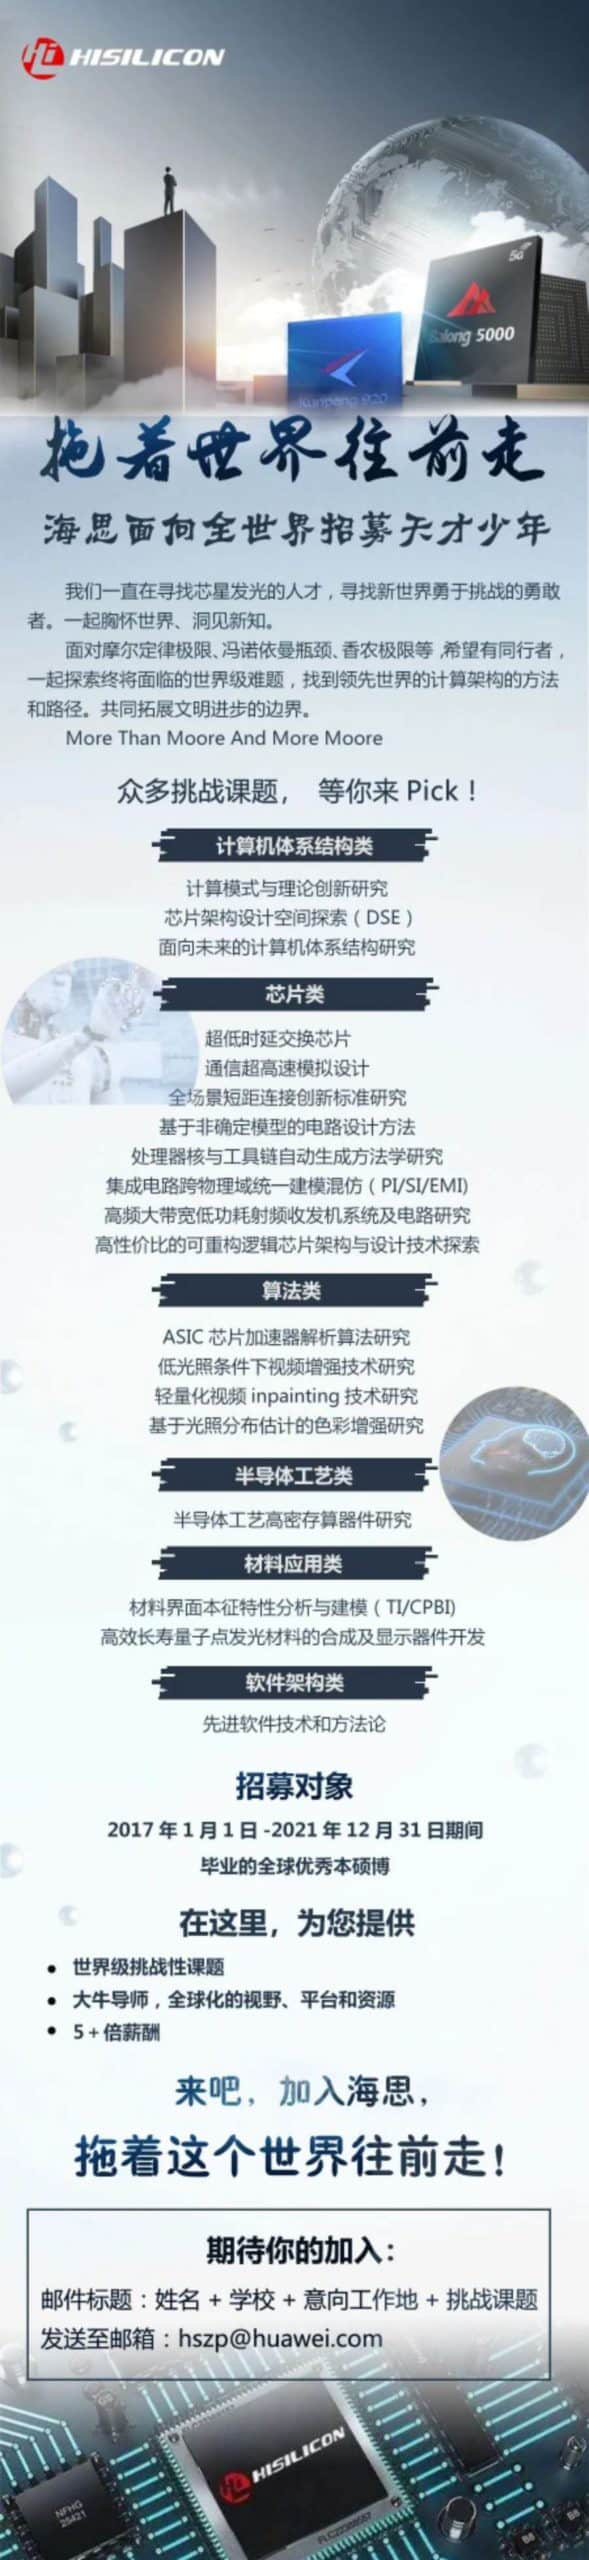 Huawei HiSilicon hiring